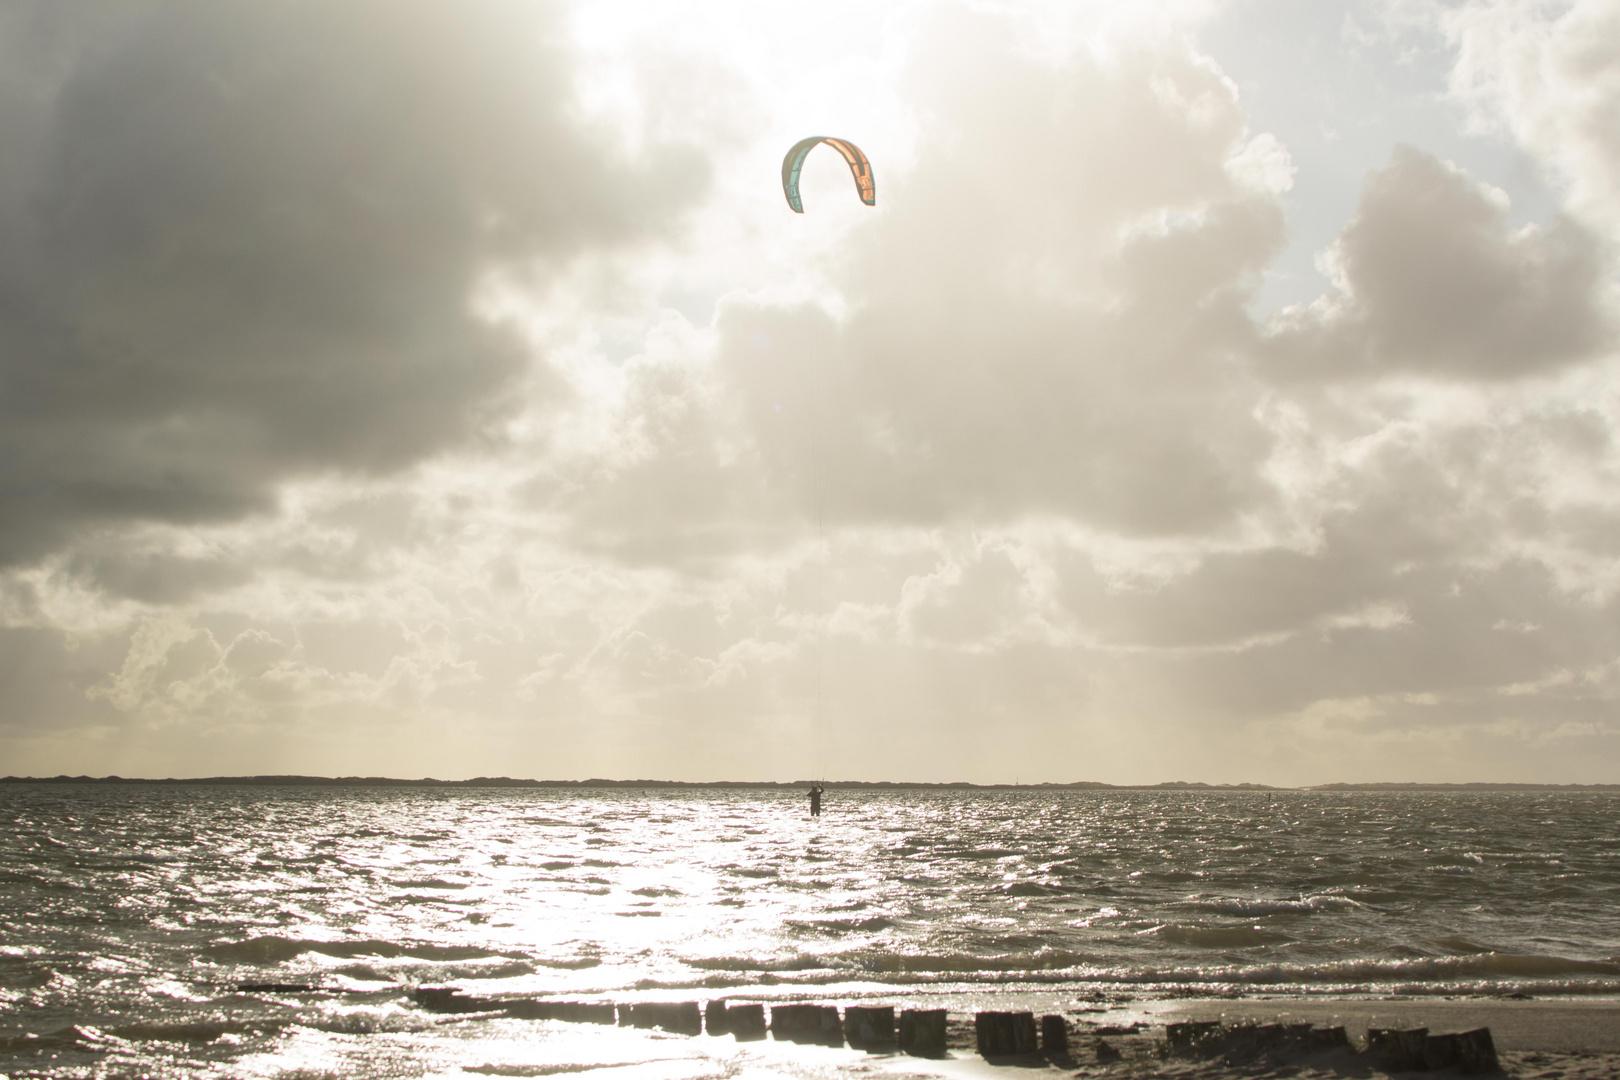 Dänemark 2015, Rømø, Wind- und Kitesurfer